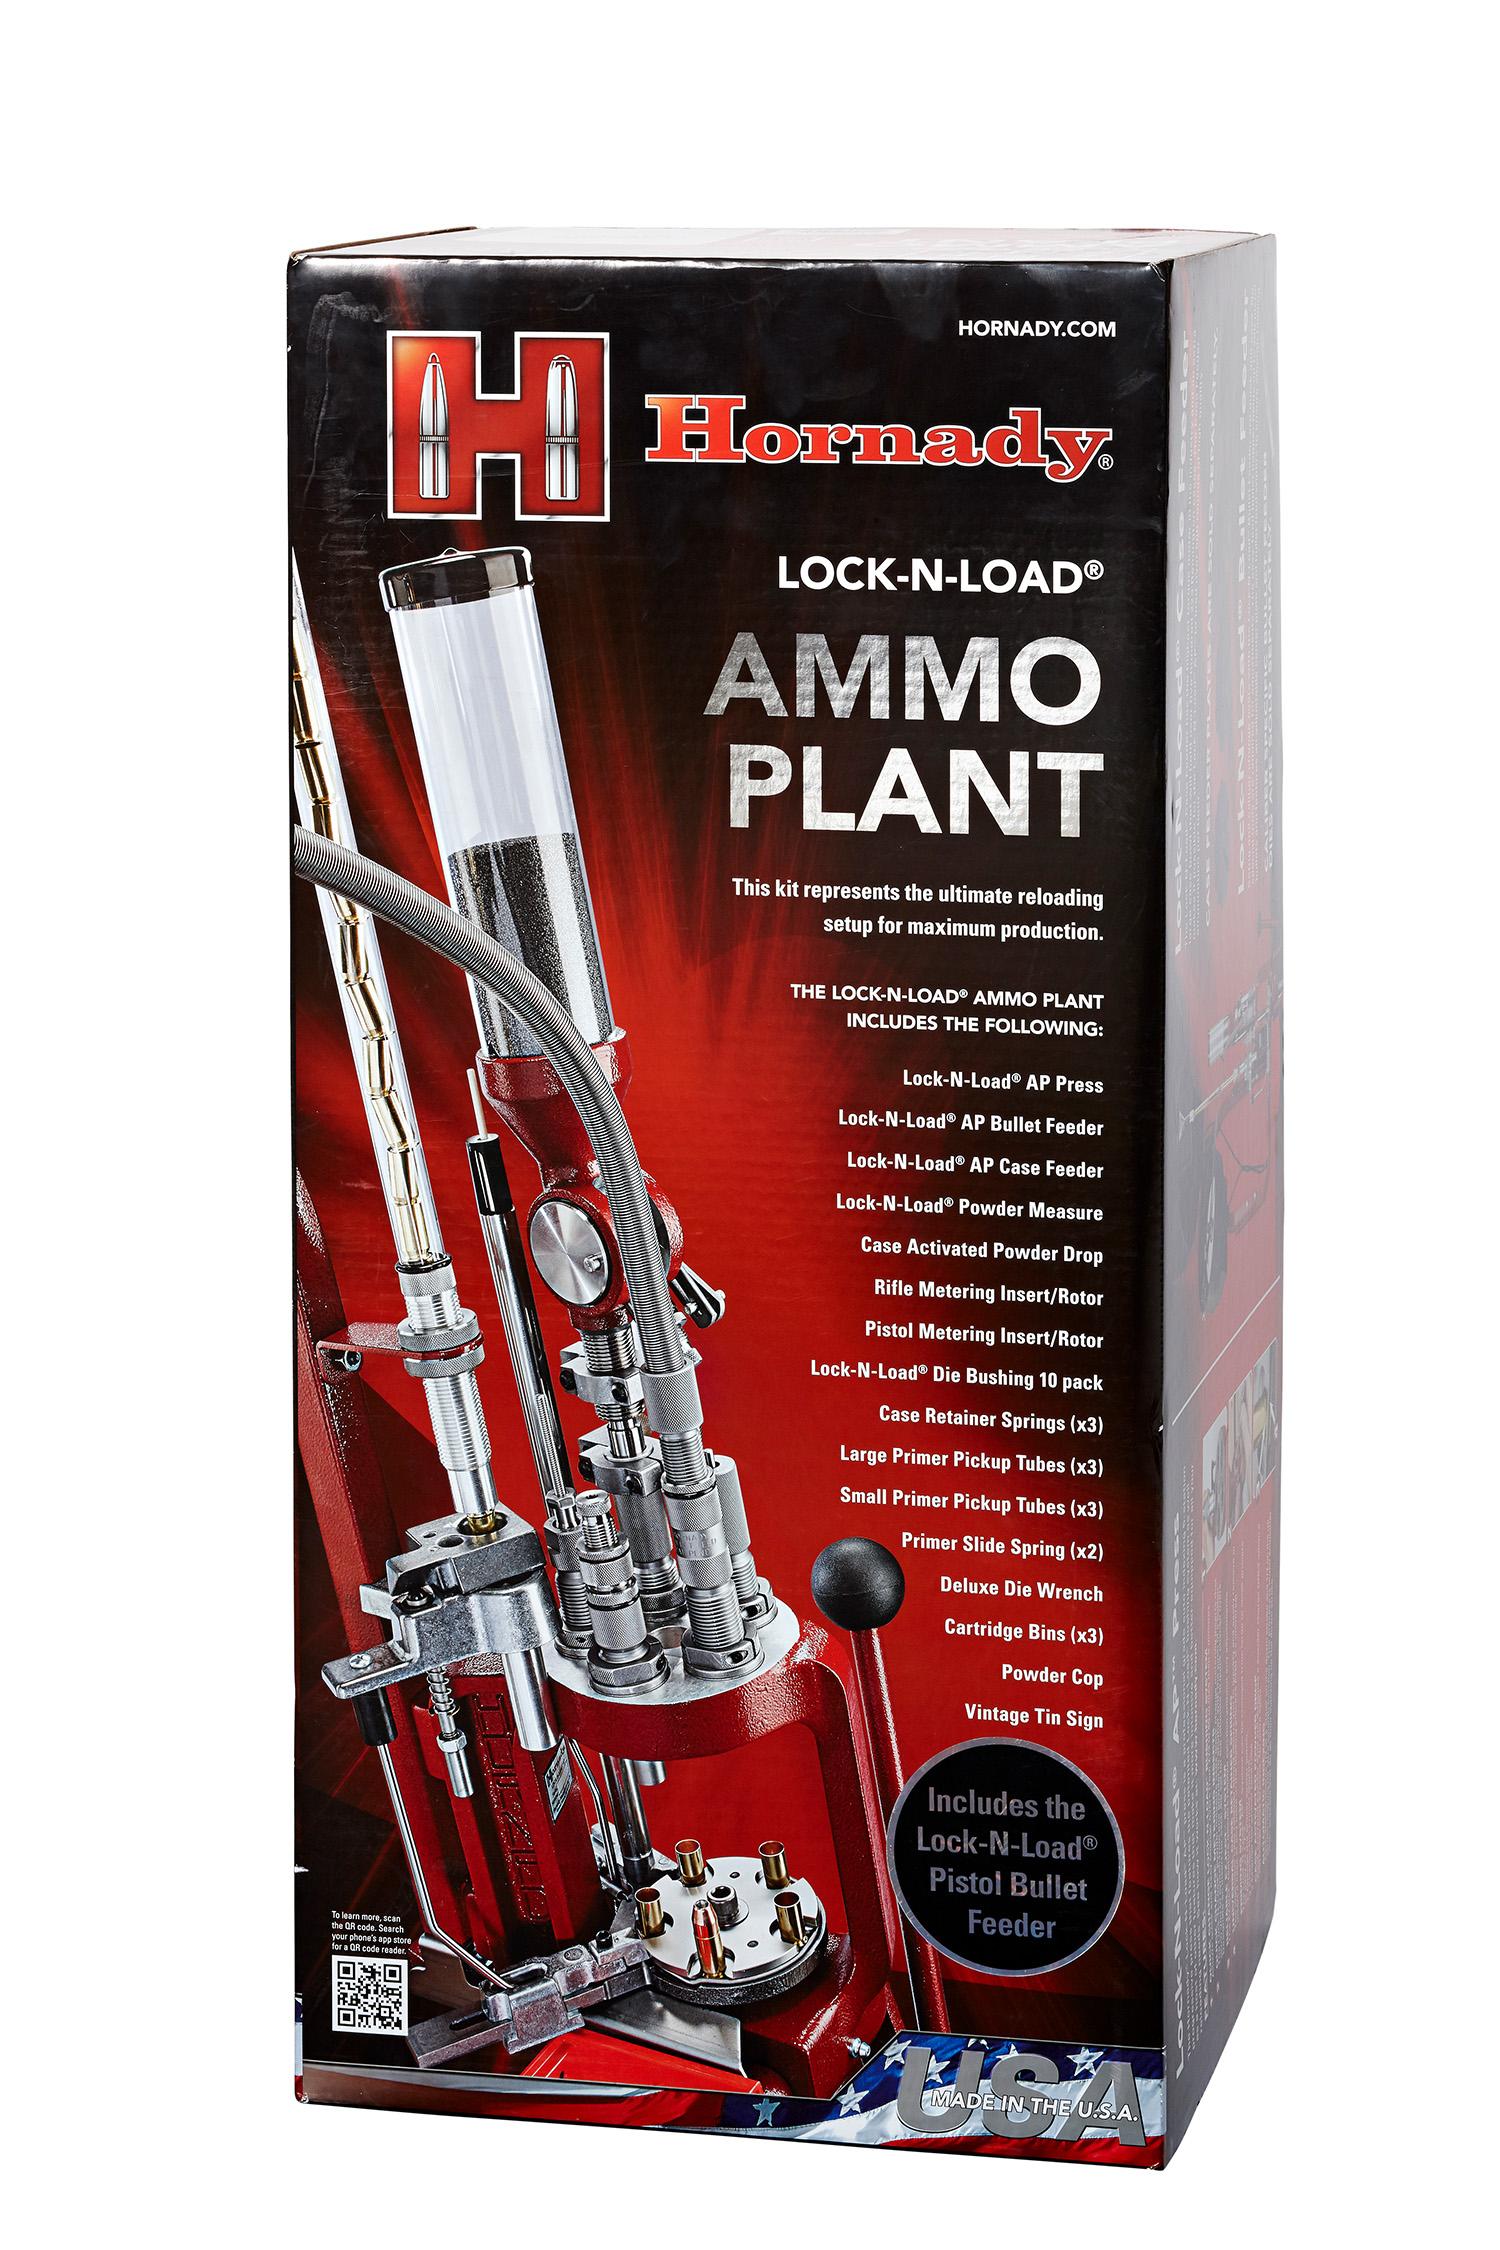 Hornady 095160 Lock-N-Load Ammo Plant Multi-Caliber Progressive